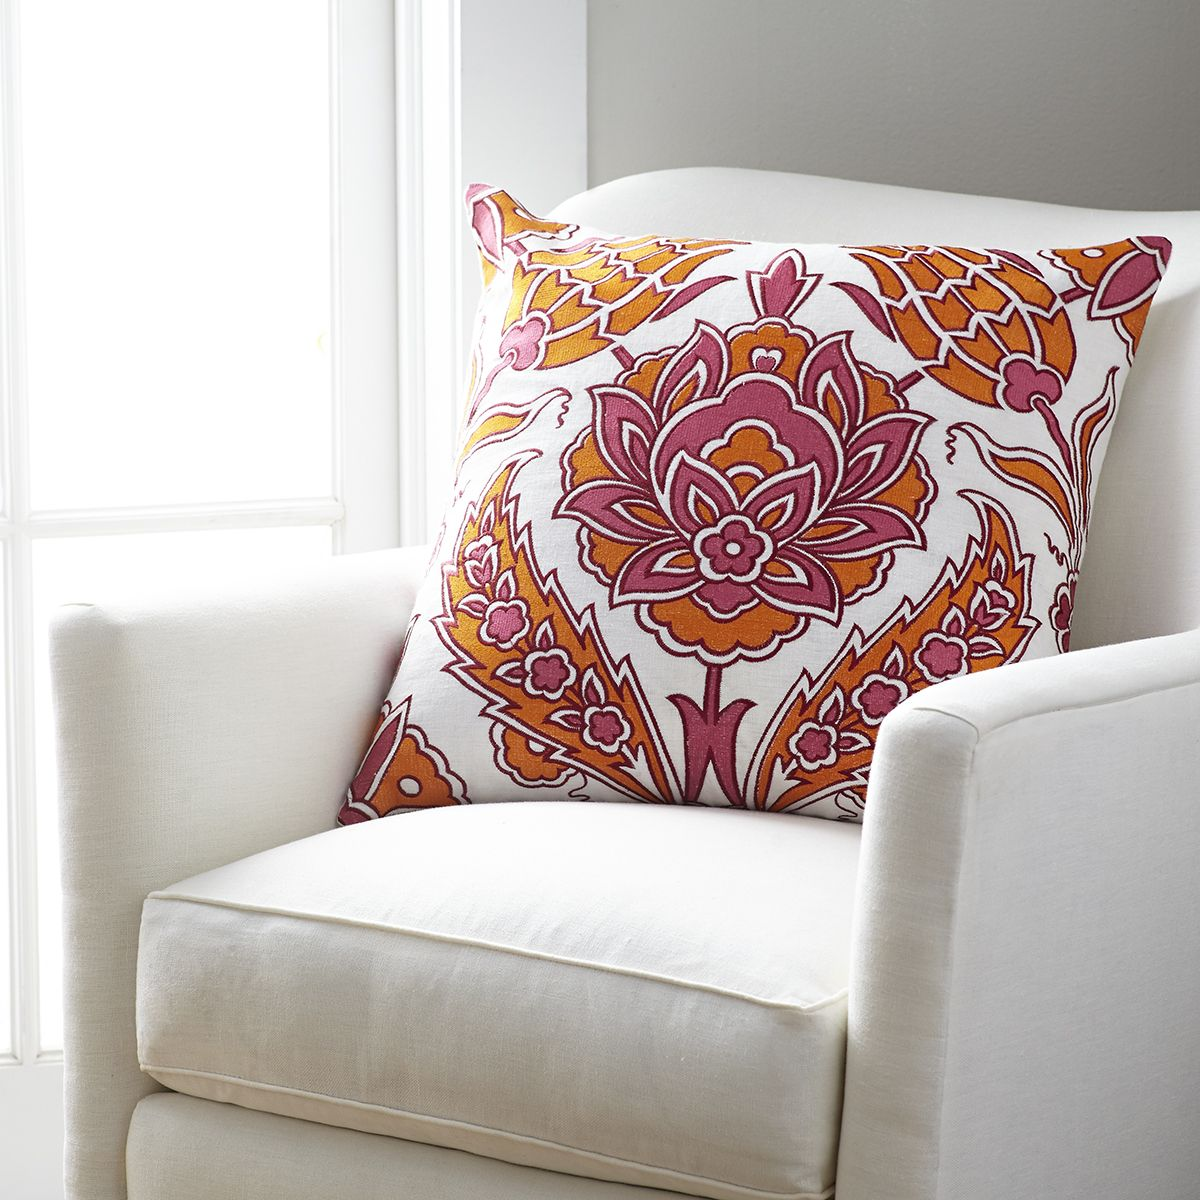 Persimmon iznik pillow cover u tulip products pinterest